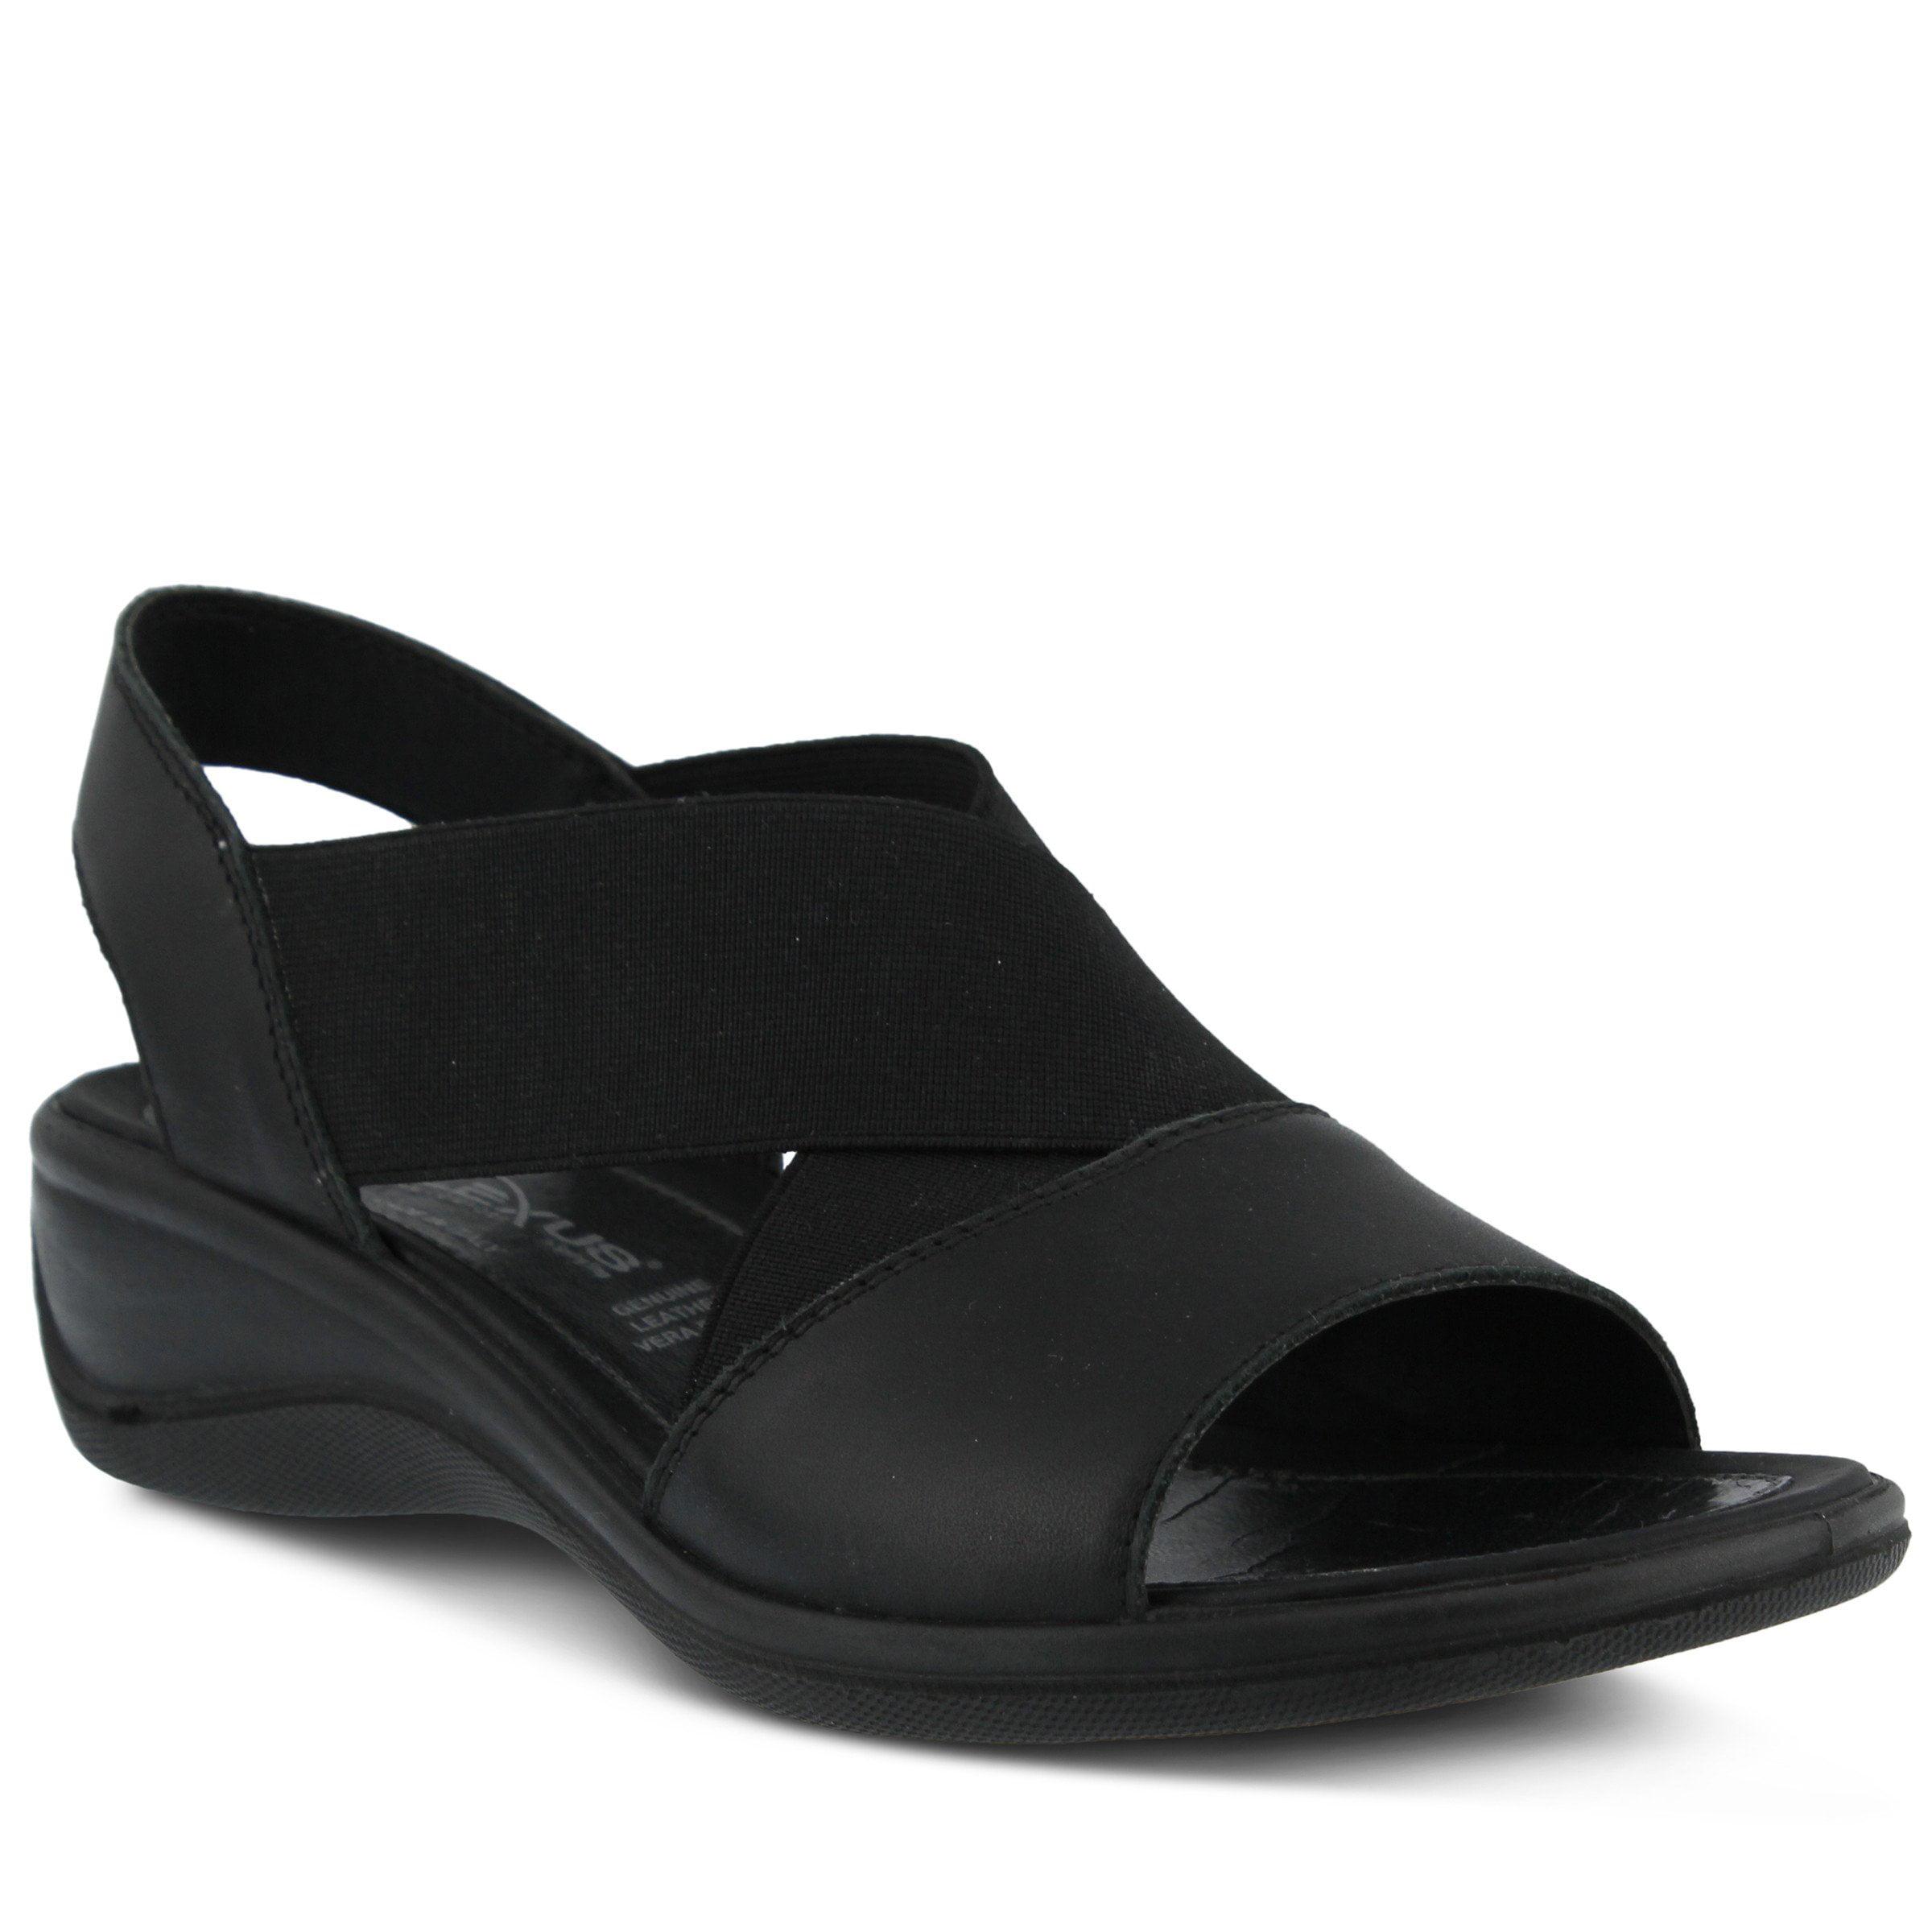 EMMA-B - EMMA 35 Euro (Women US 5) / Black